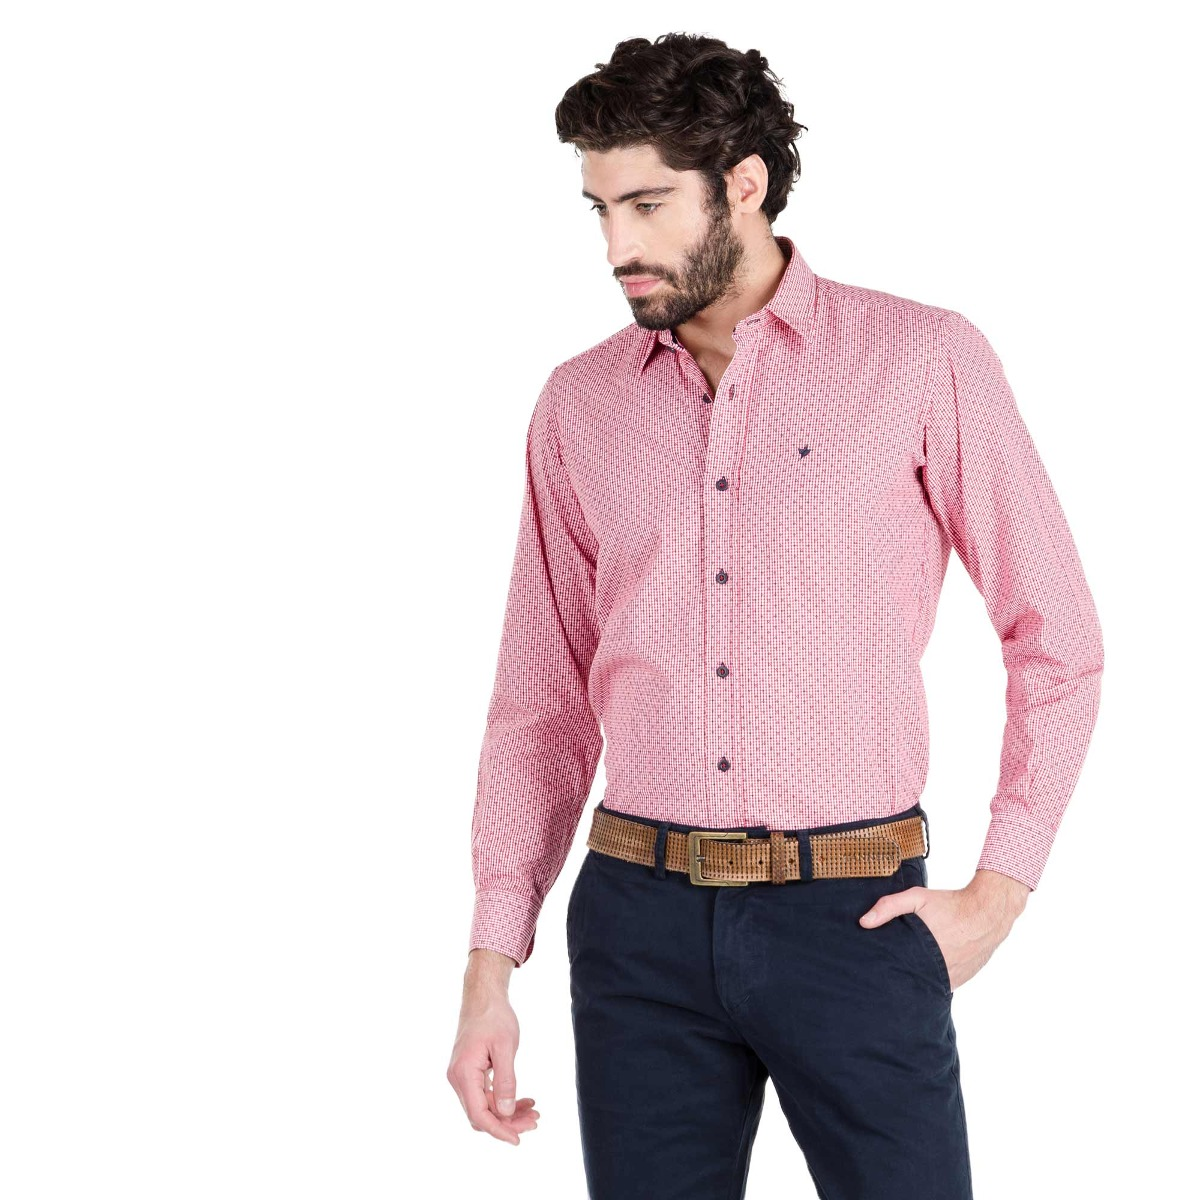 Hombre Grant Manga Tannery Larga Camisa Y7f6gvyb